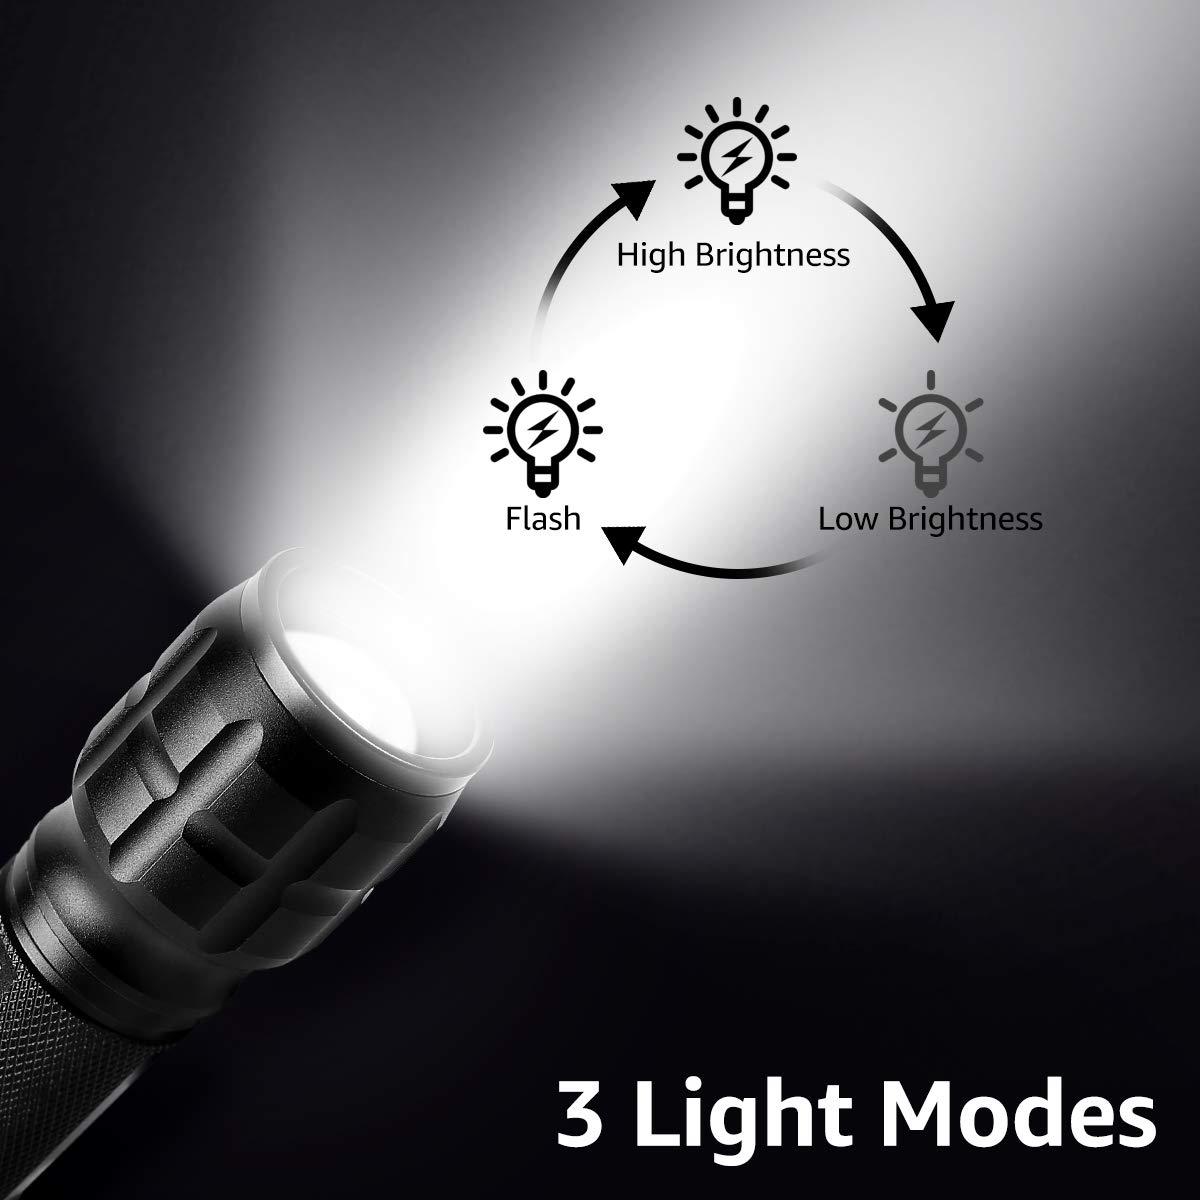 Incluida 3 AAA Pilas LE Linterna LED de Mano 3 Modos Luz Alta Potencia Linternas Antorcha Zoomble Flashlight LED Impermeable para Ciclismo Camping Monta/ñismo